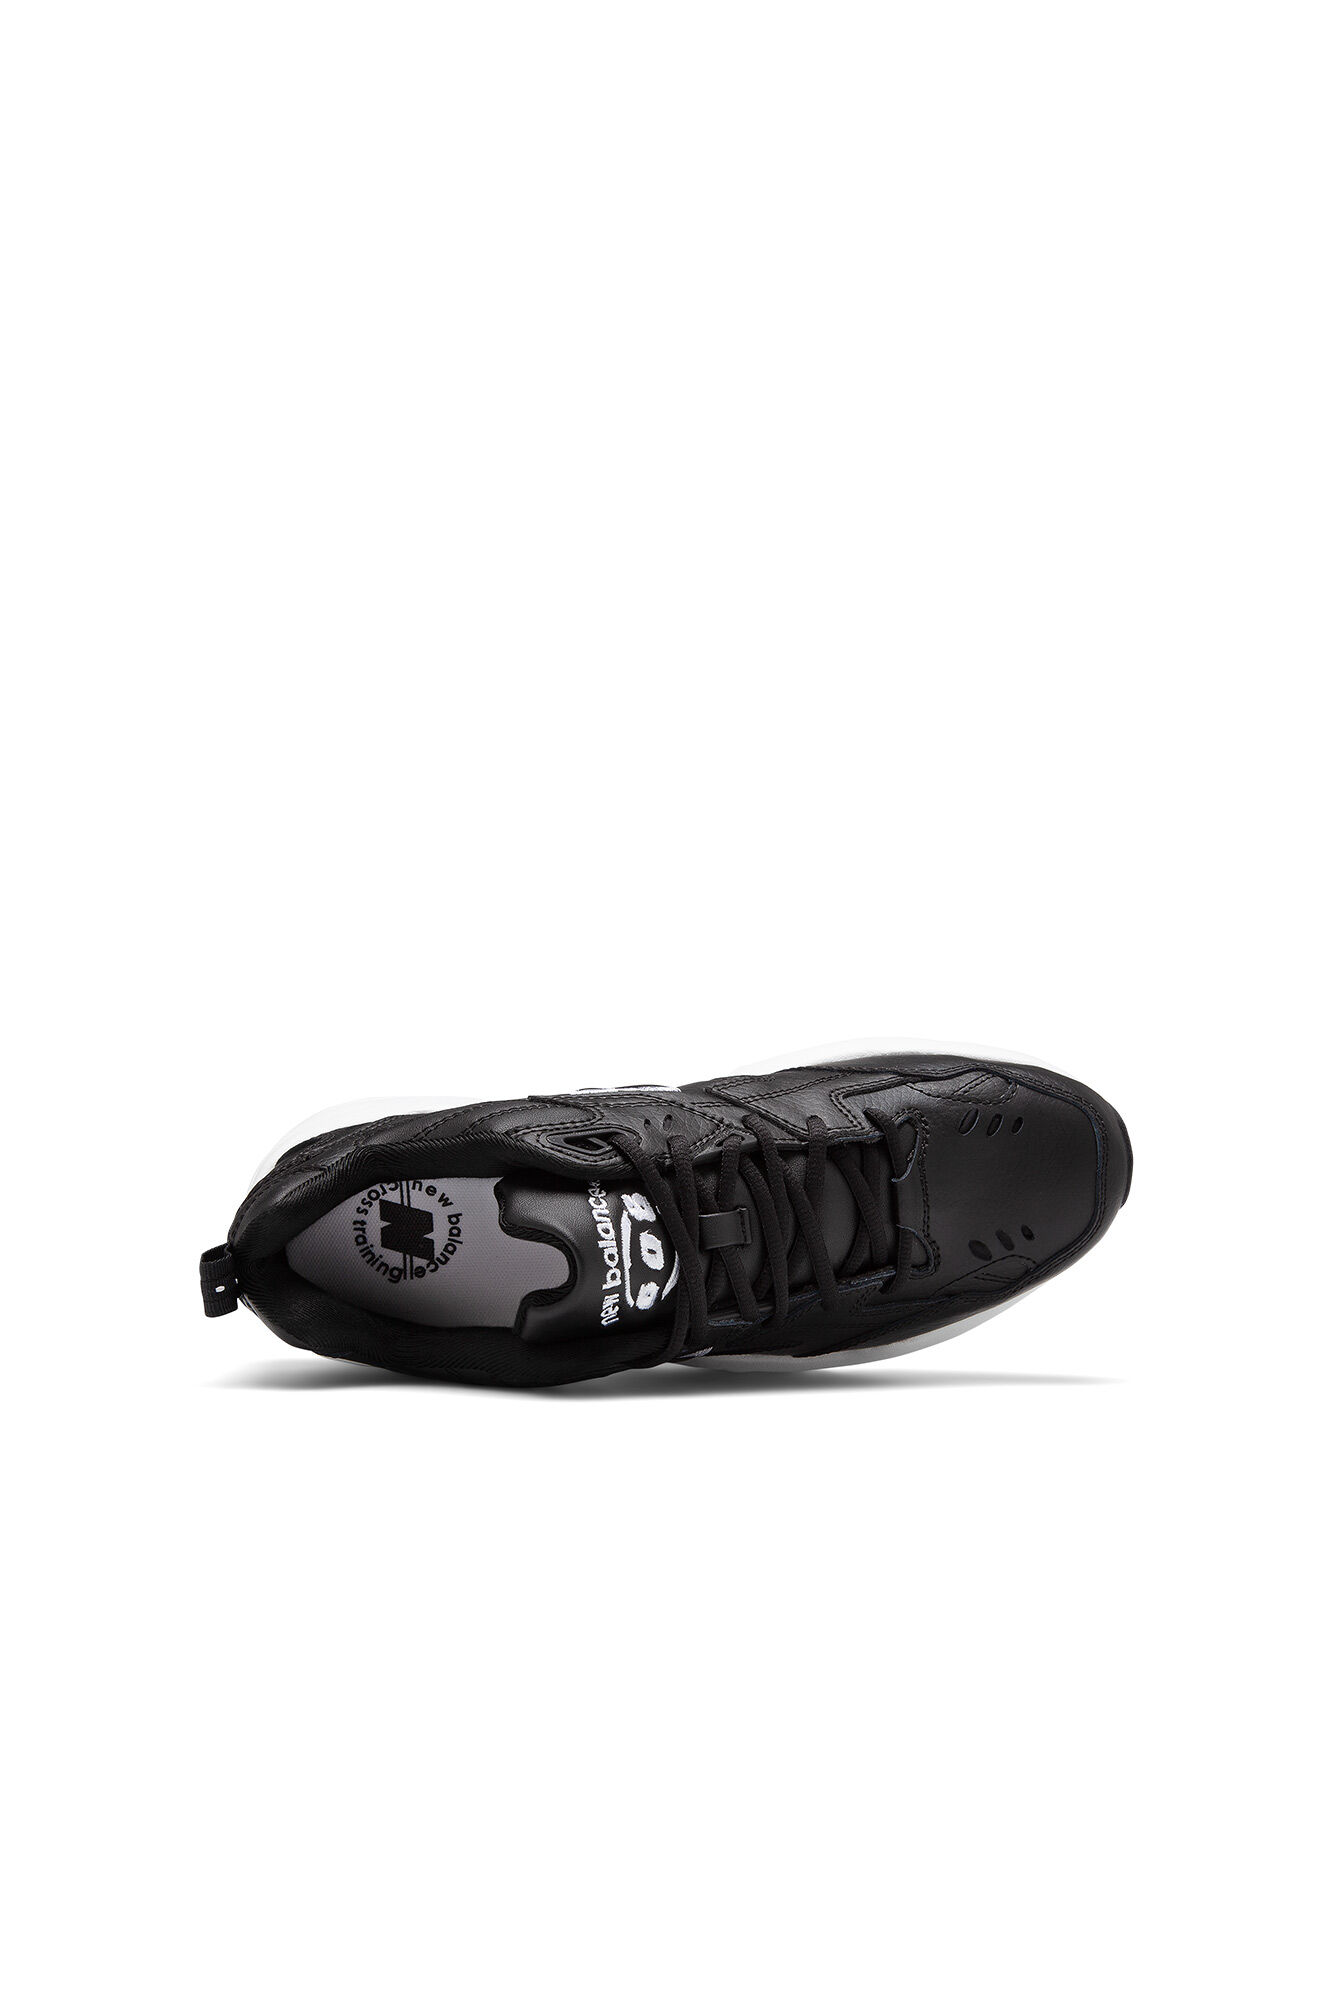 MX608BW1, BLACK